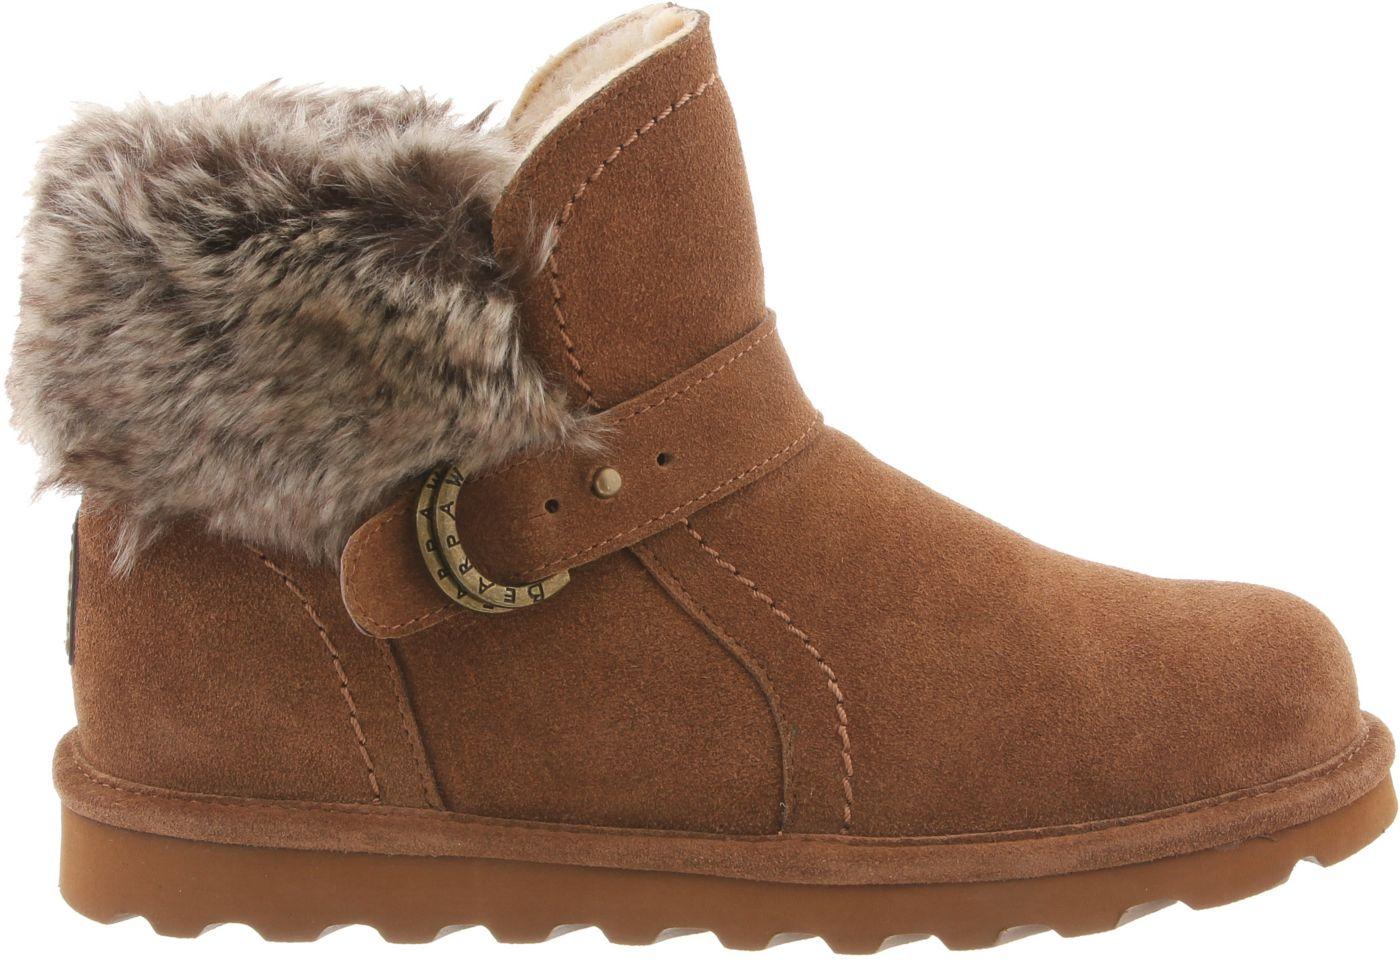 BEARPAW Women's Koko Winter Boots